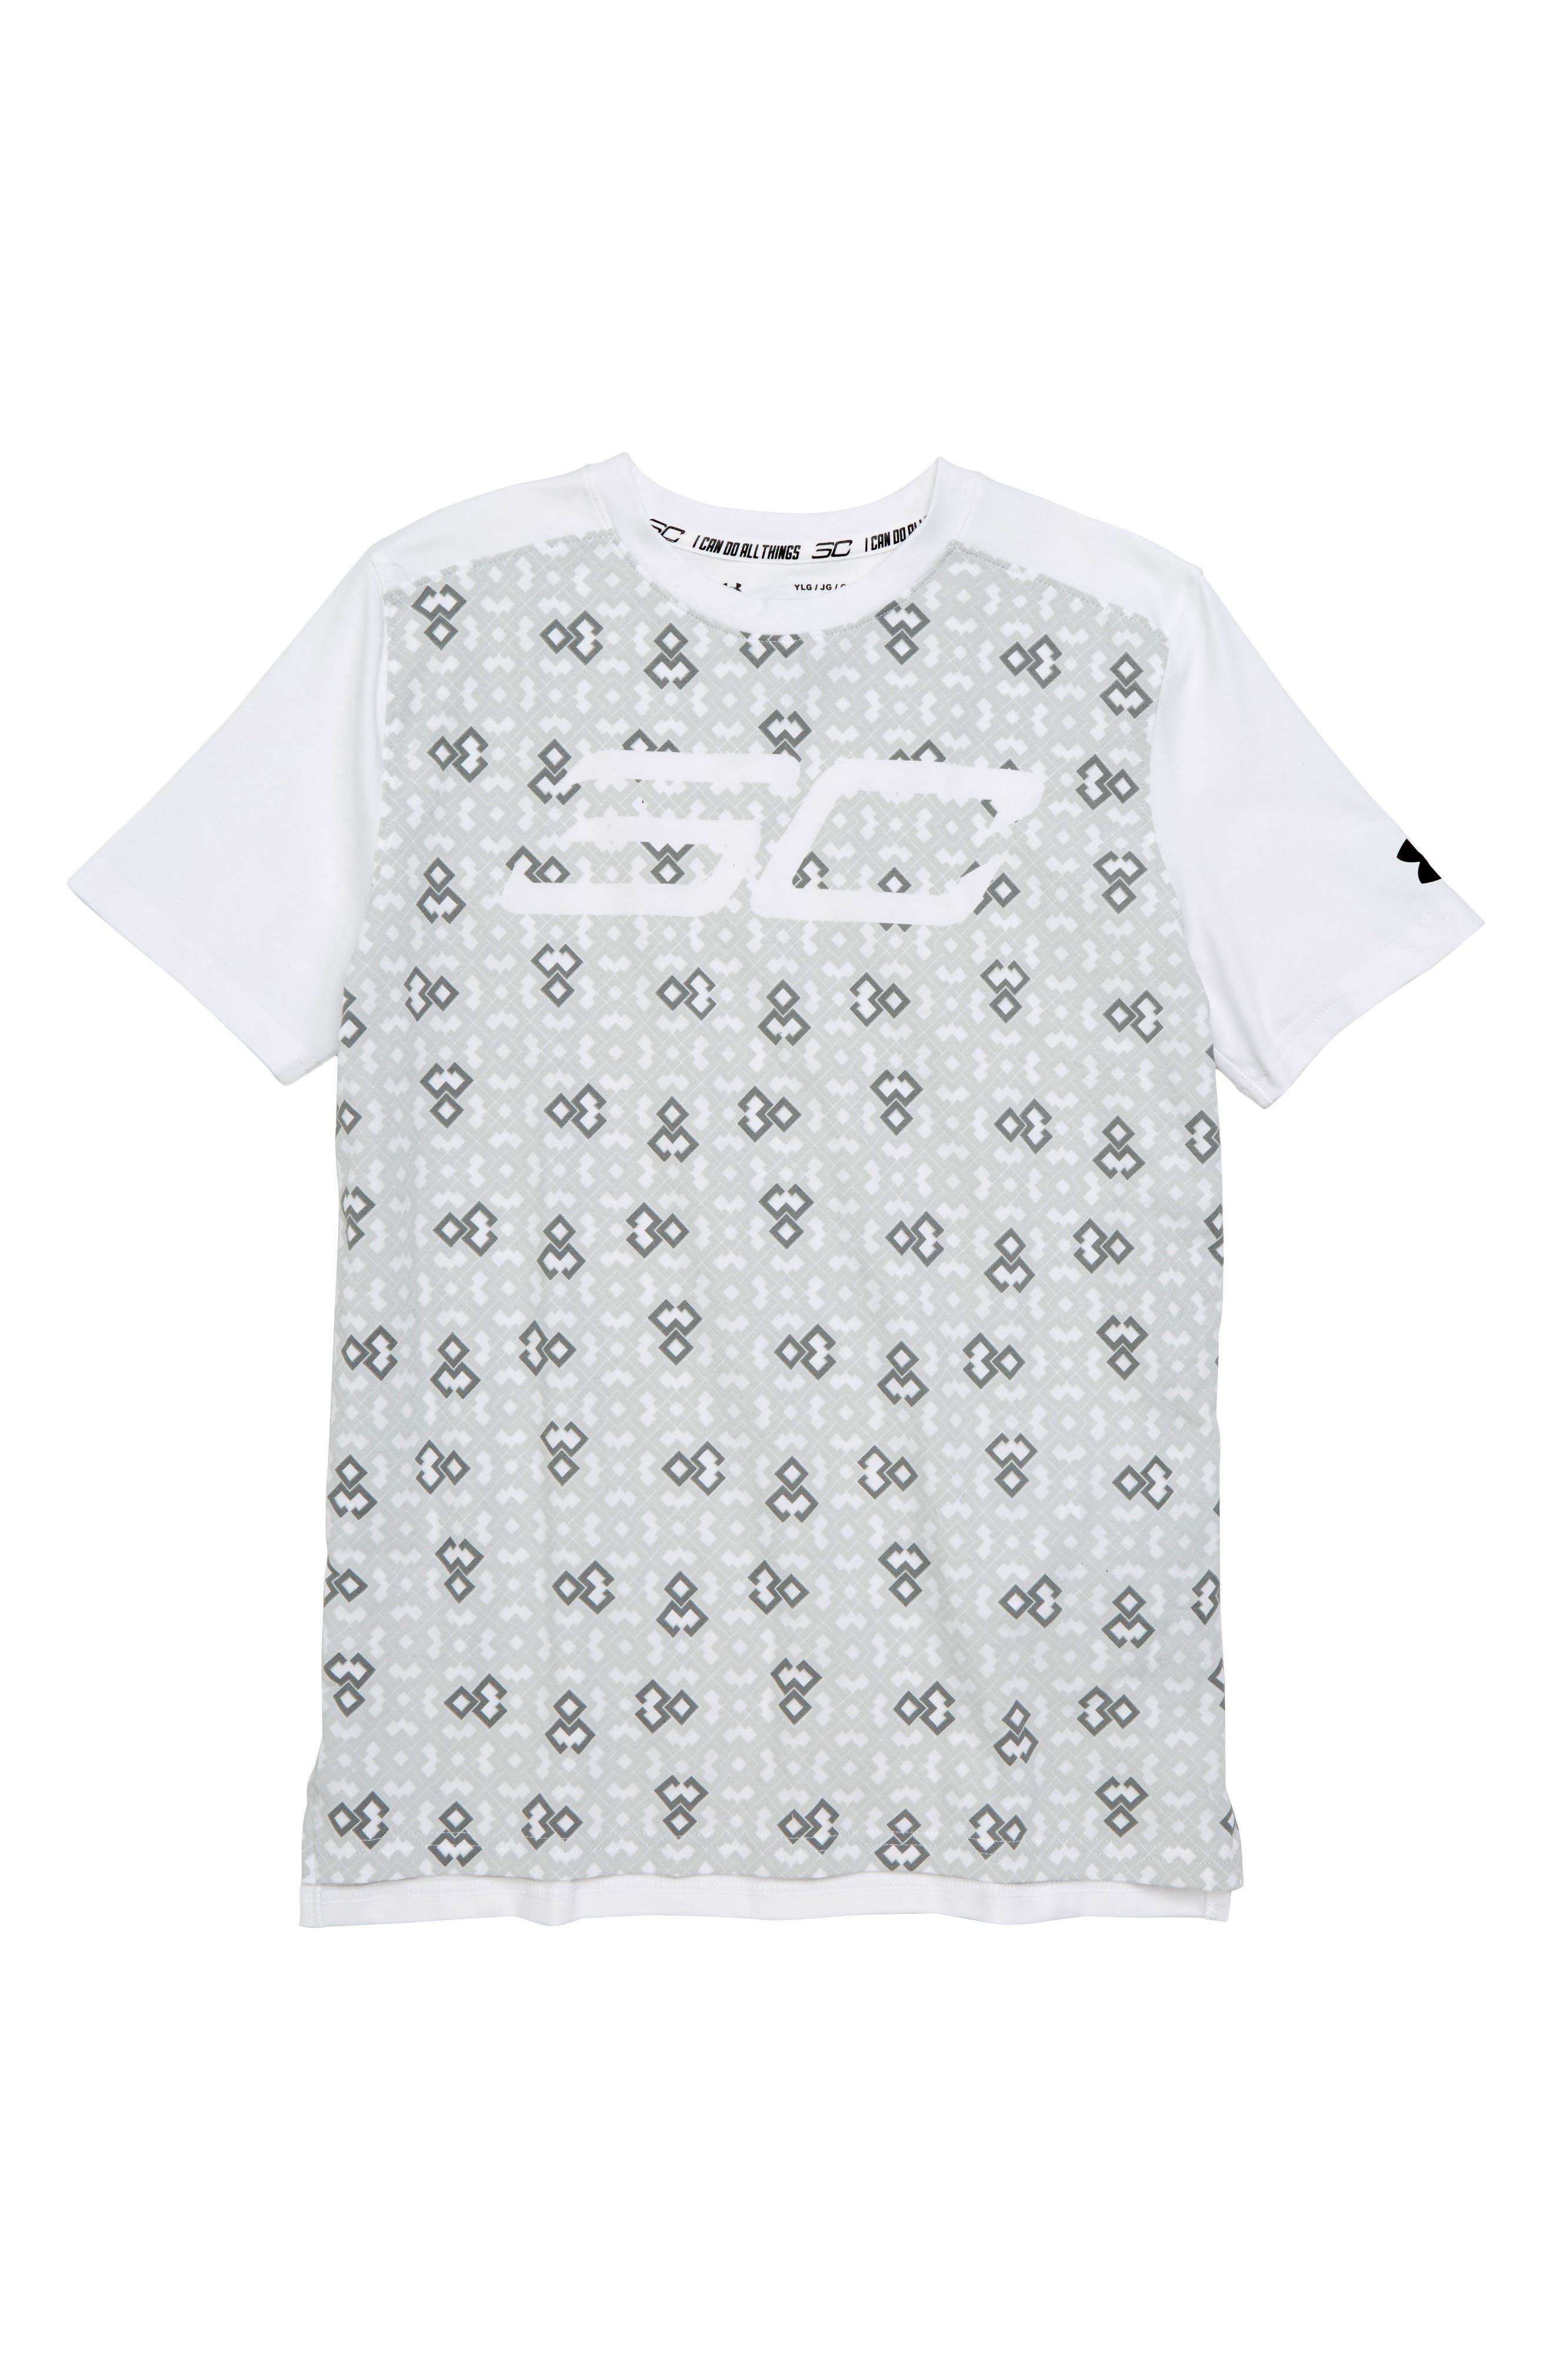 Performance SC30 HeatGear<sup>®</sup> Shirt,                         Main,                         color, White/ Black